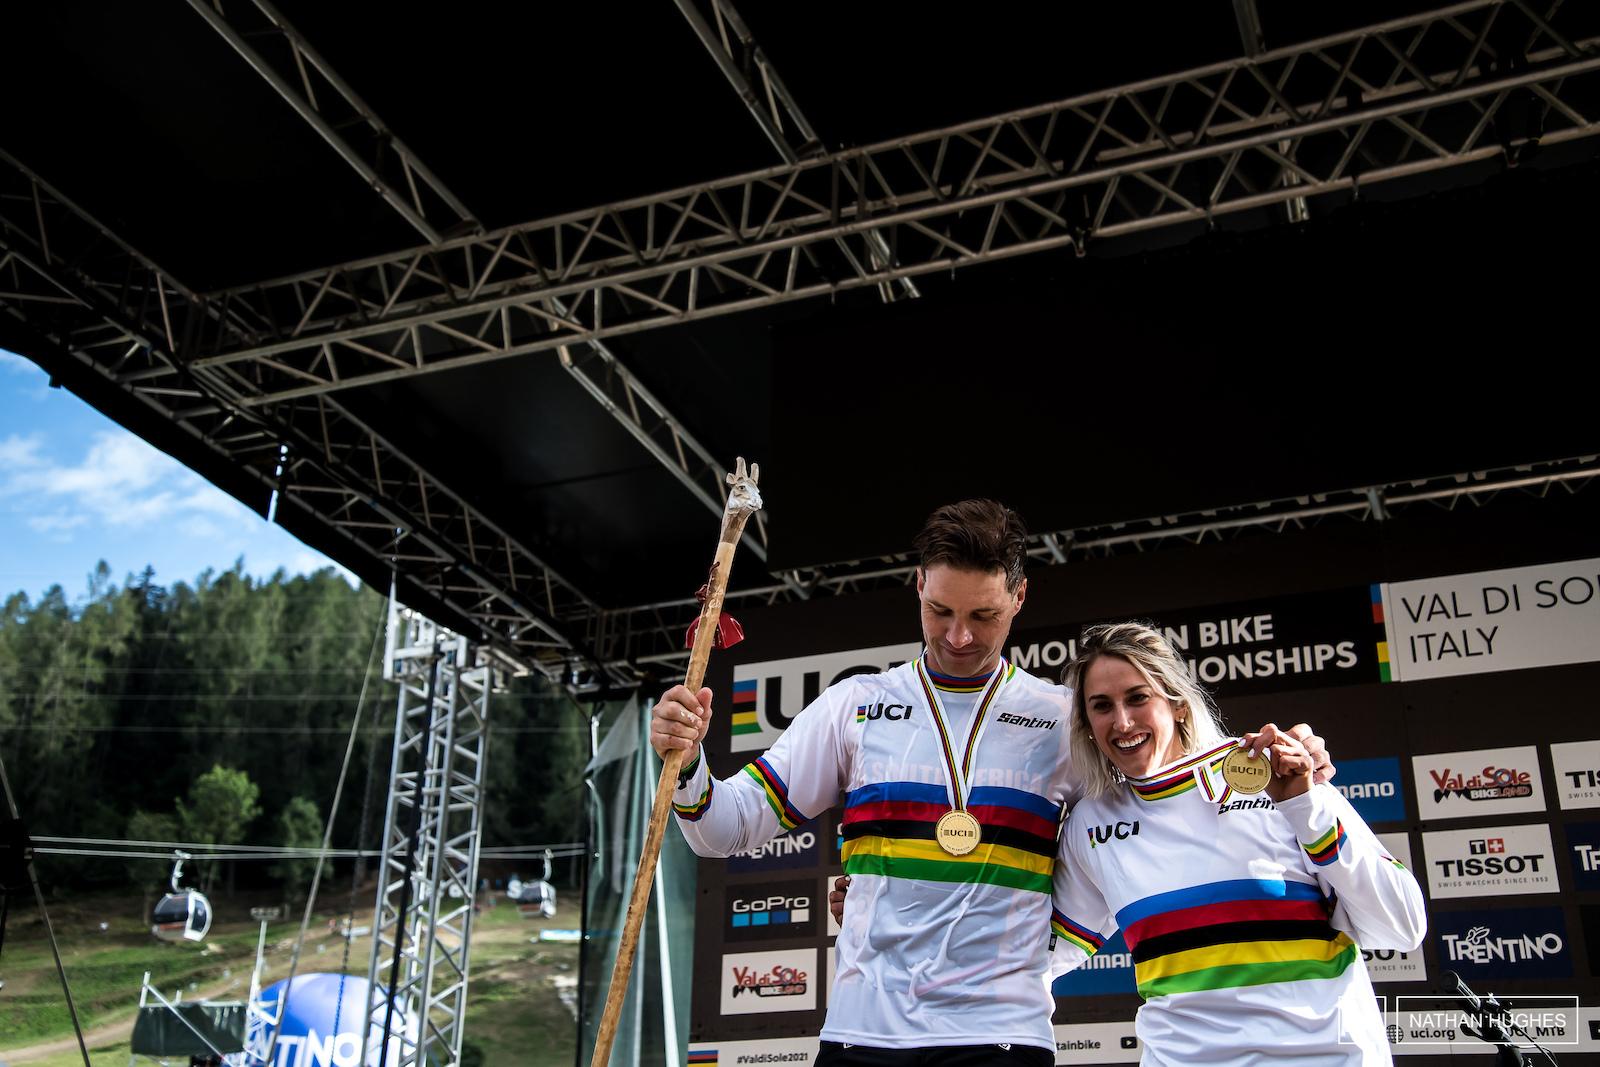 The new rainbow bearers headed into 2022.